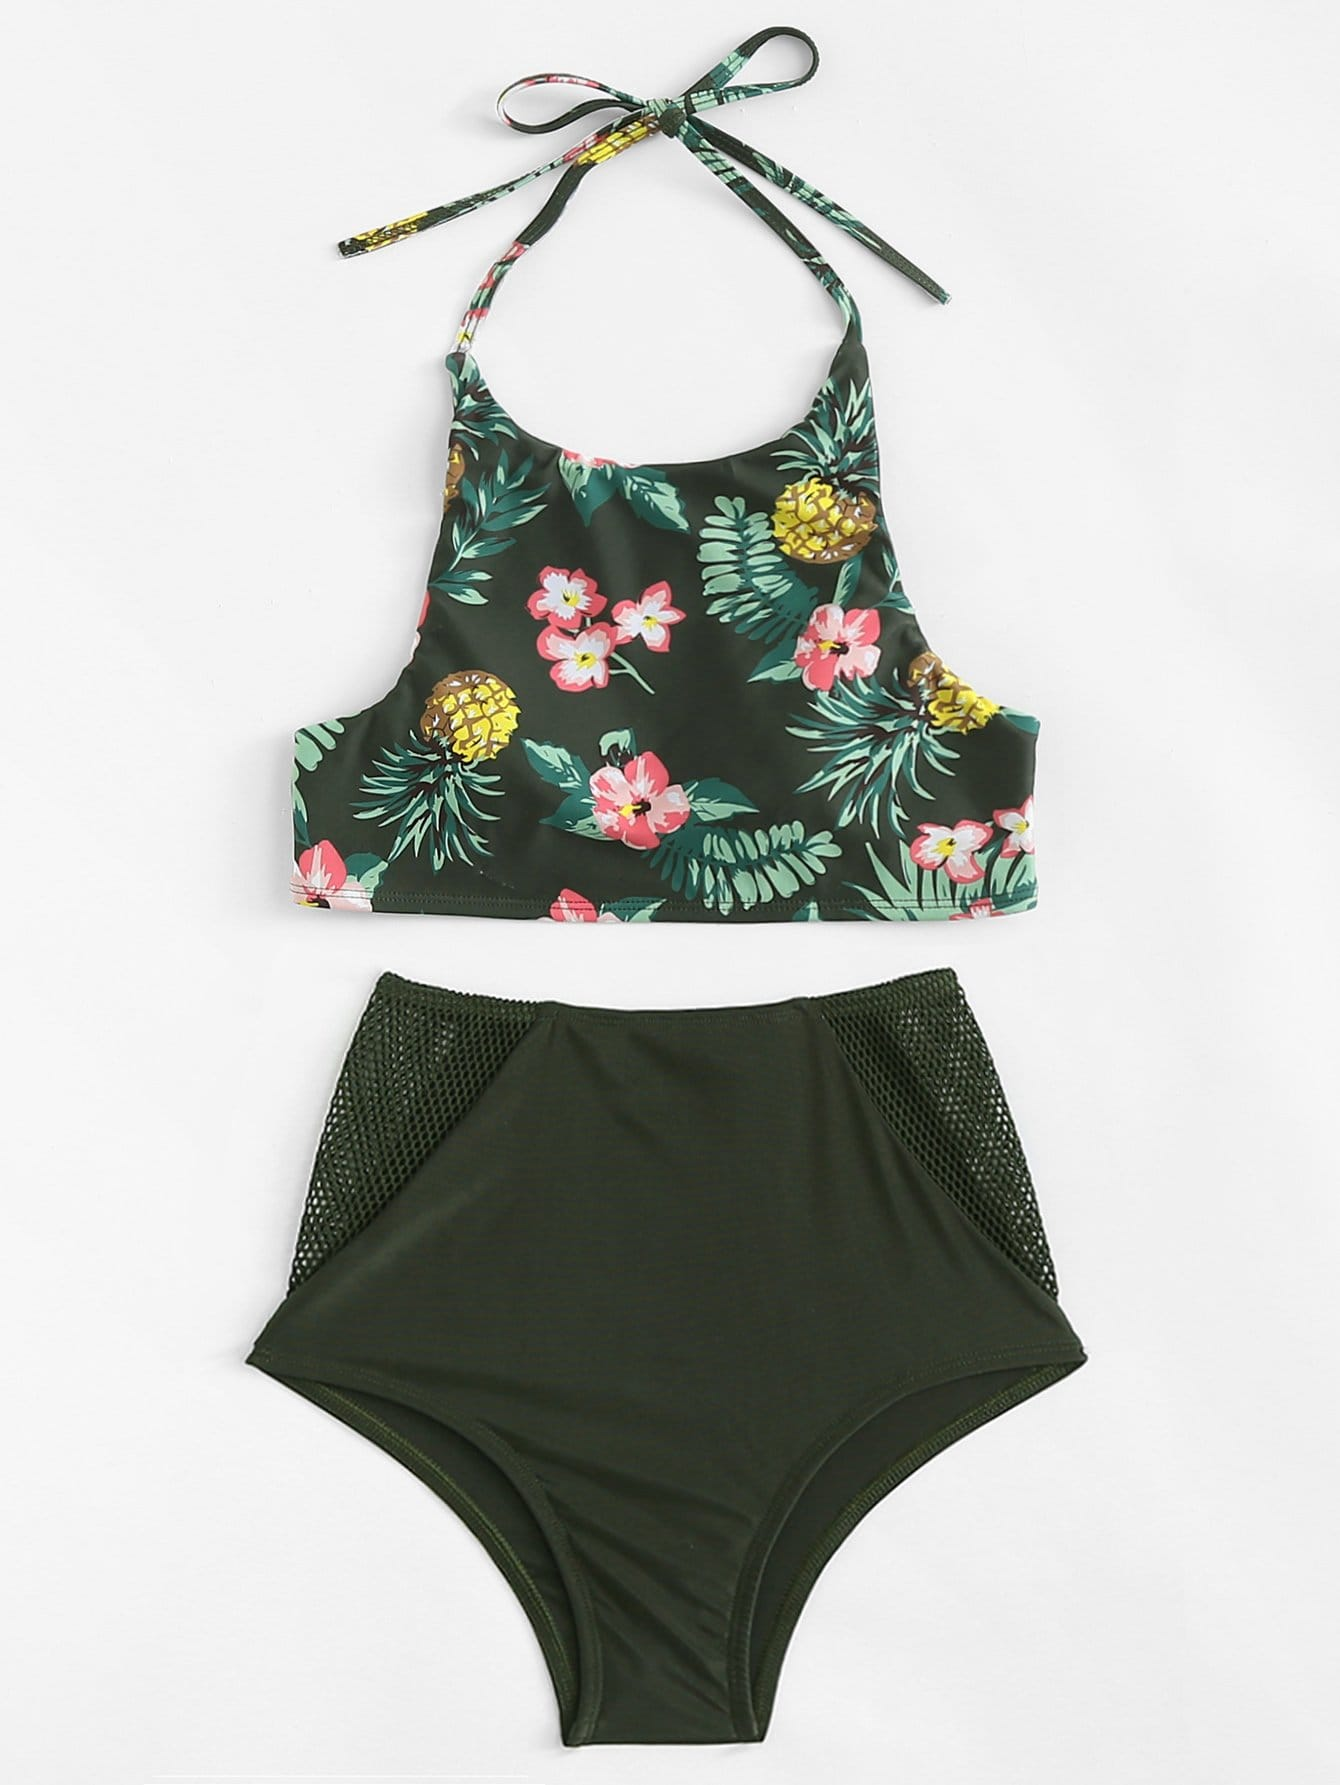 Tropical Print Cut Out Back Mesh Insert Bikini Set sleeveless mesh insert cut out dress